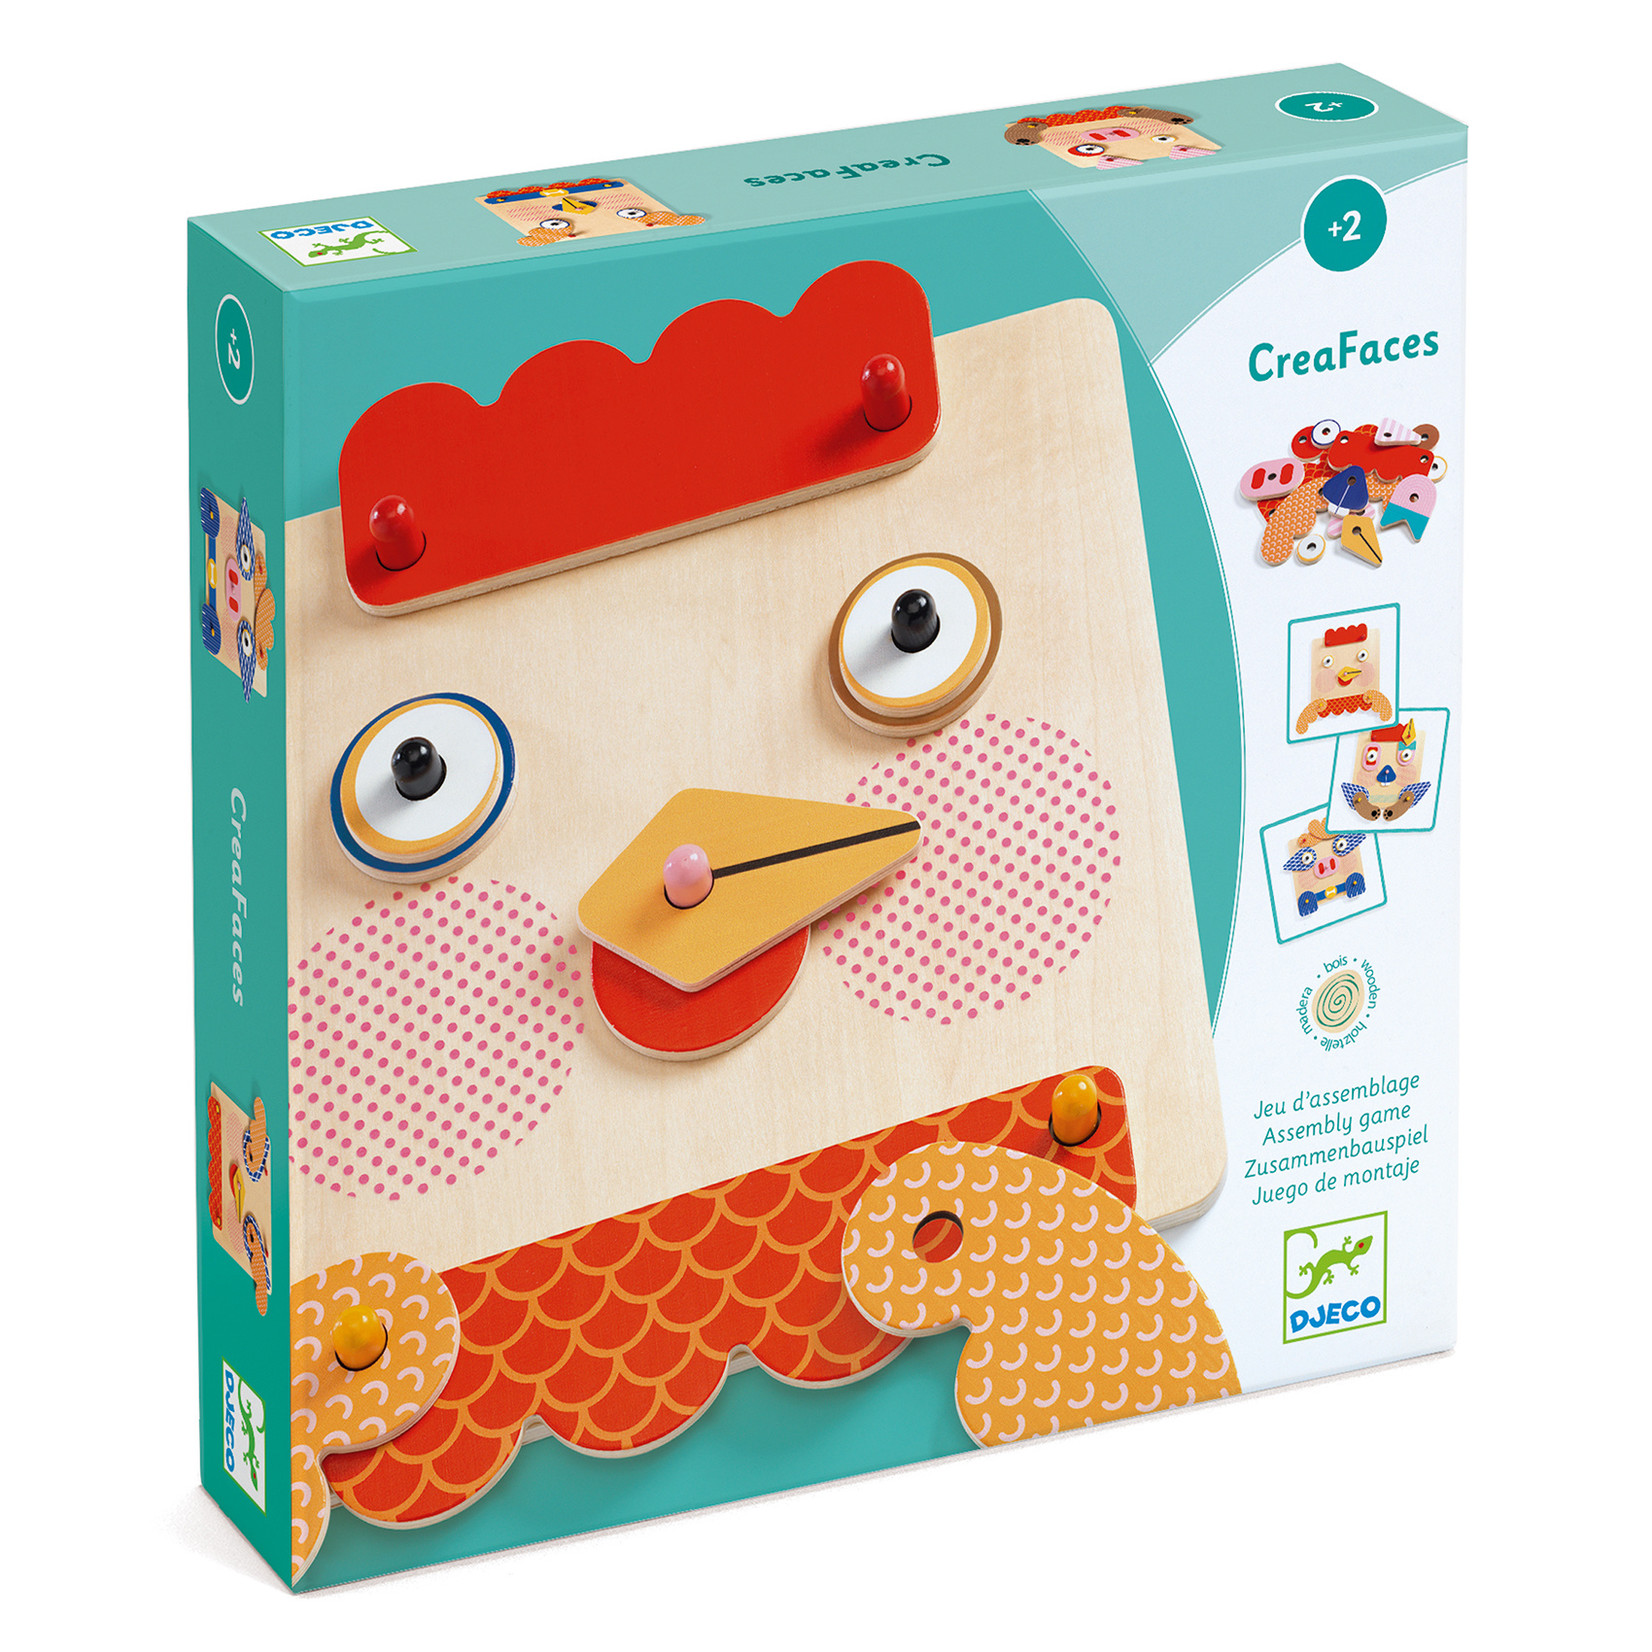 Djeco Creafaces Make-a-Face Wooden Board